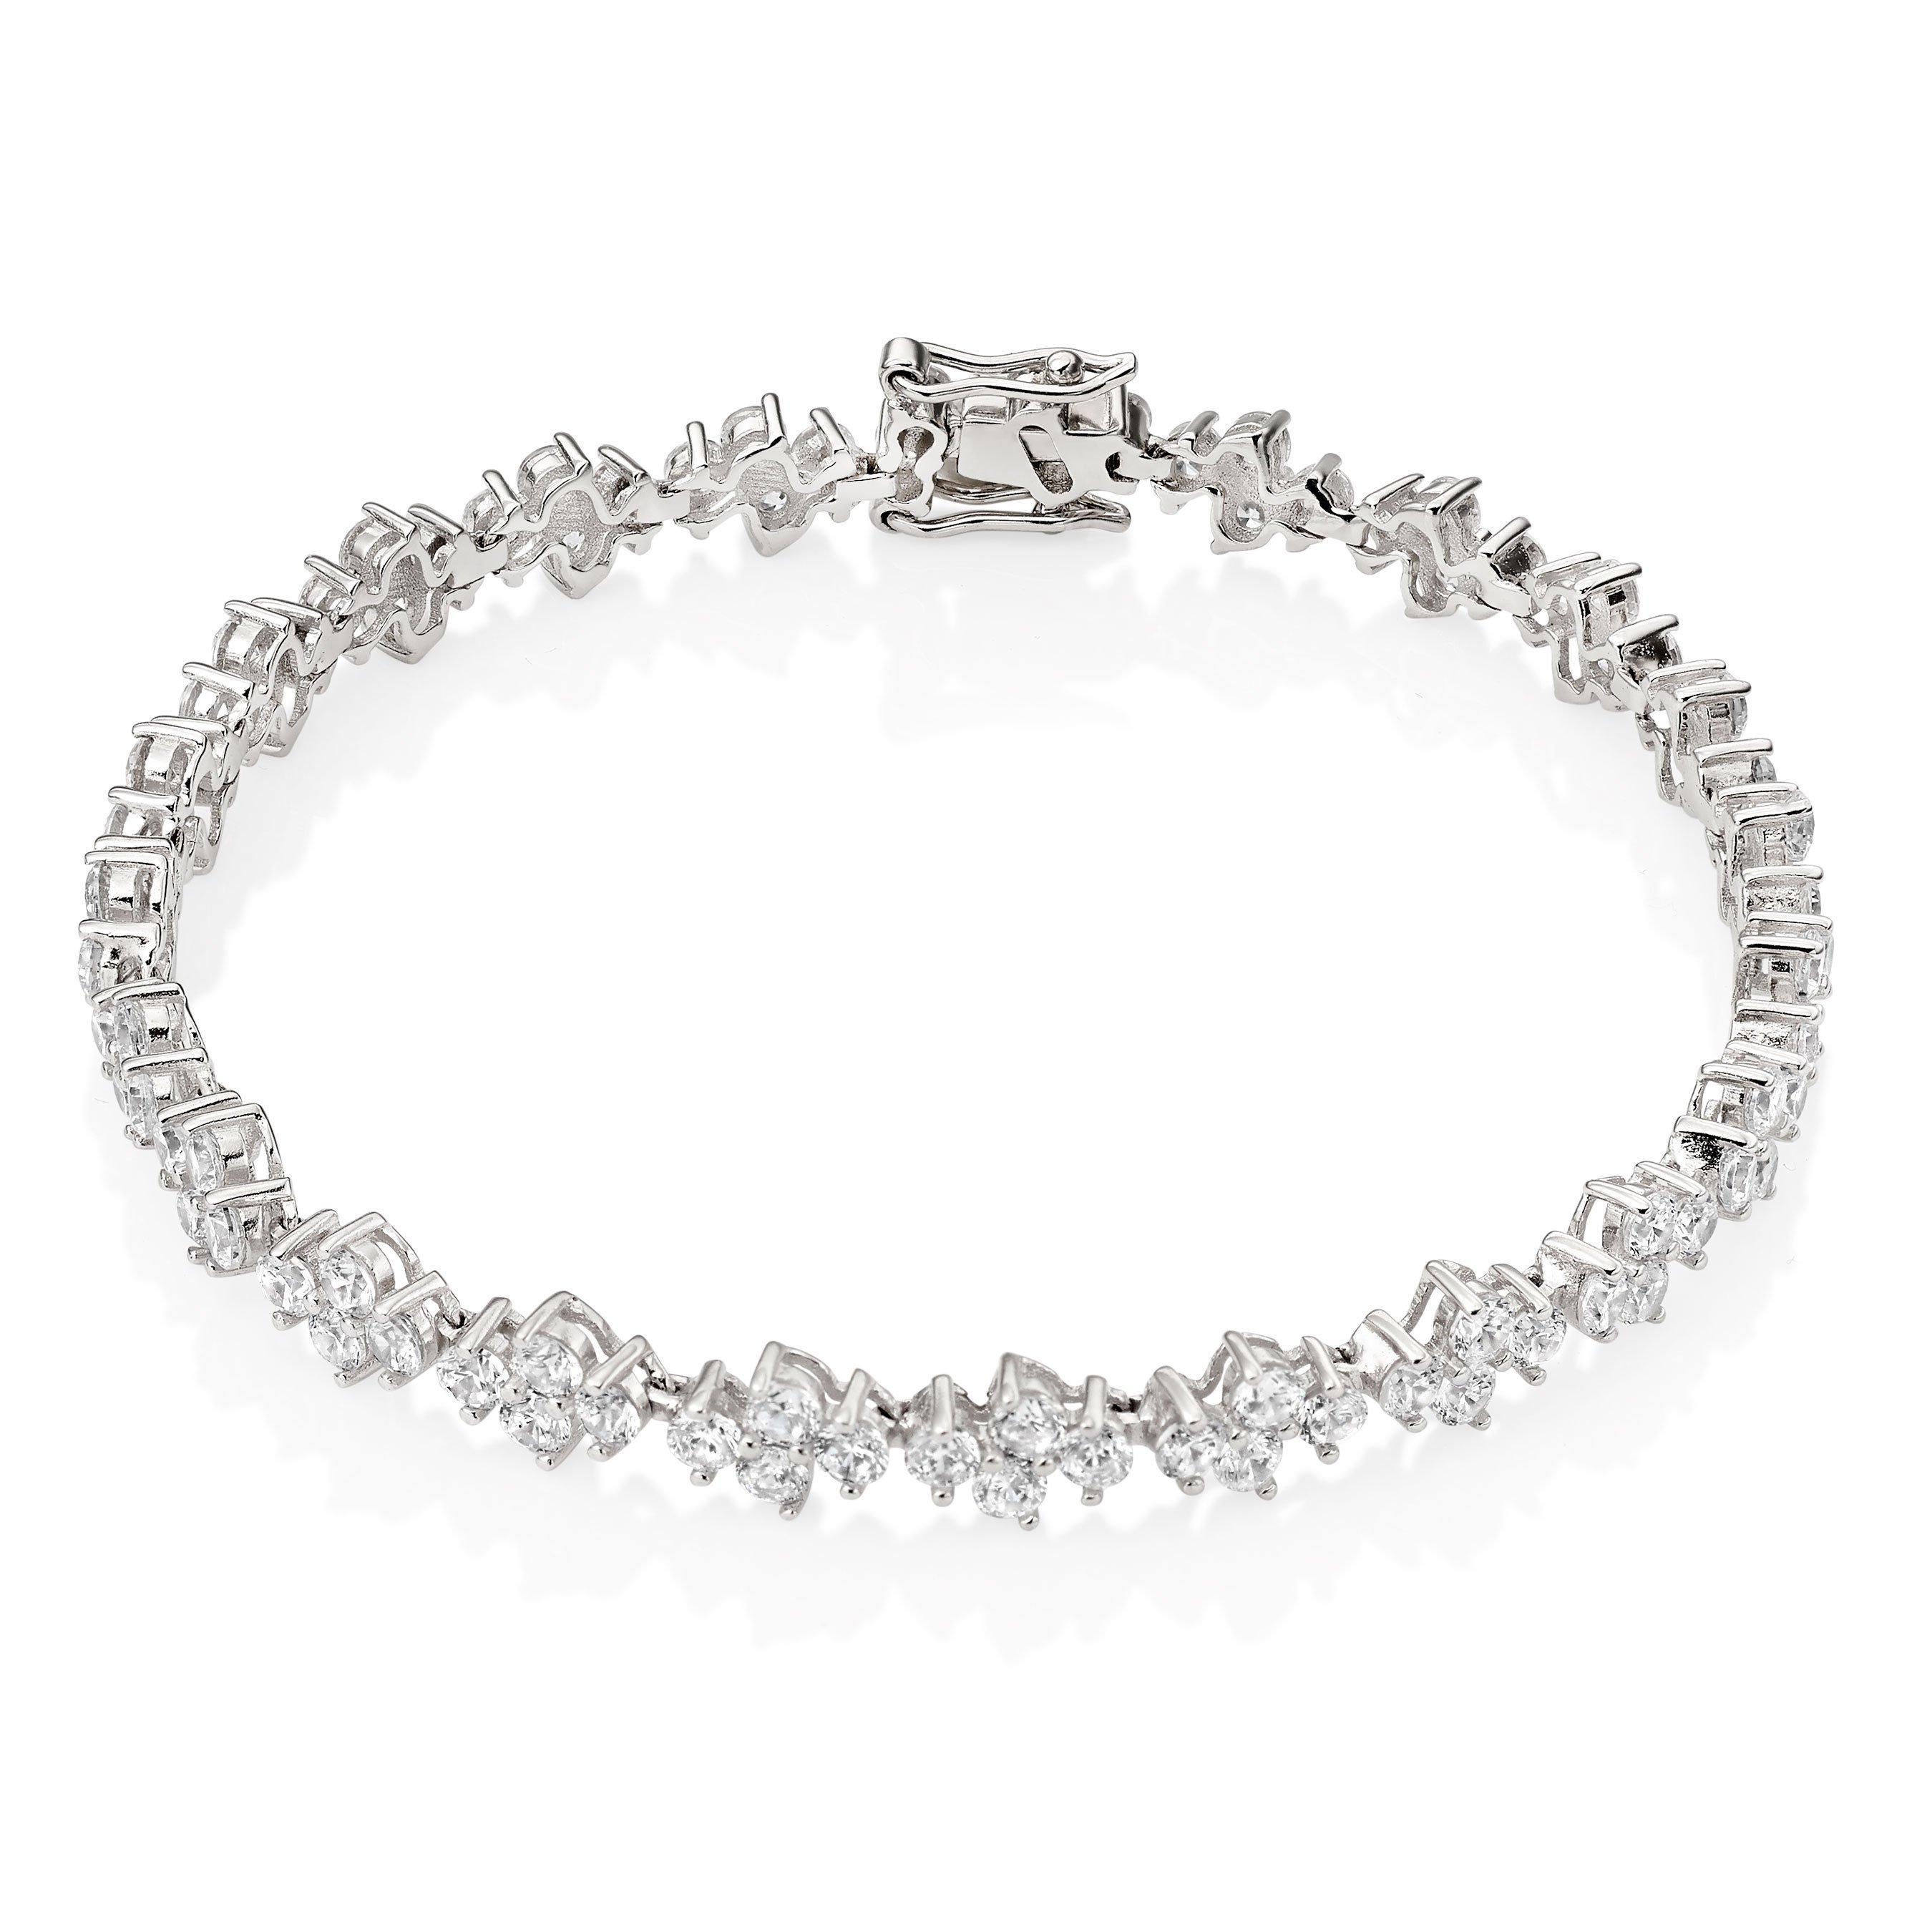 Silver Cubic Zirconia Cluster Tennis Bracelet